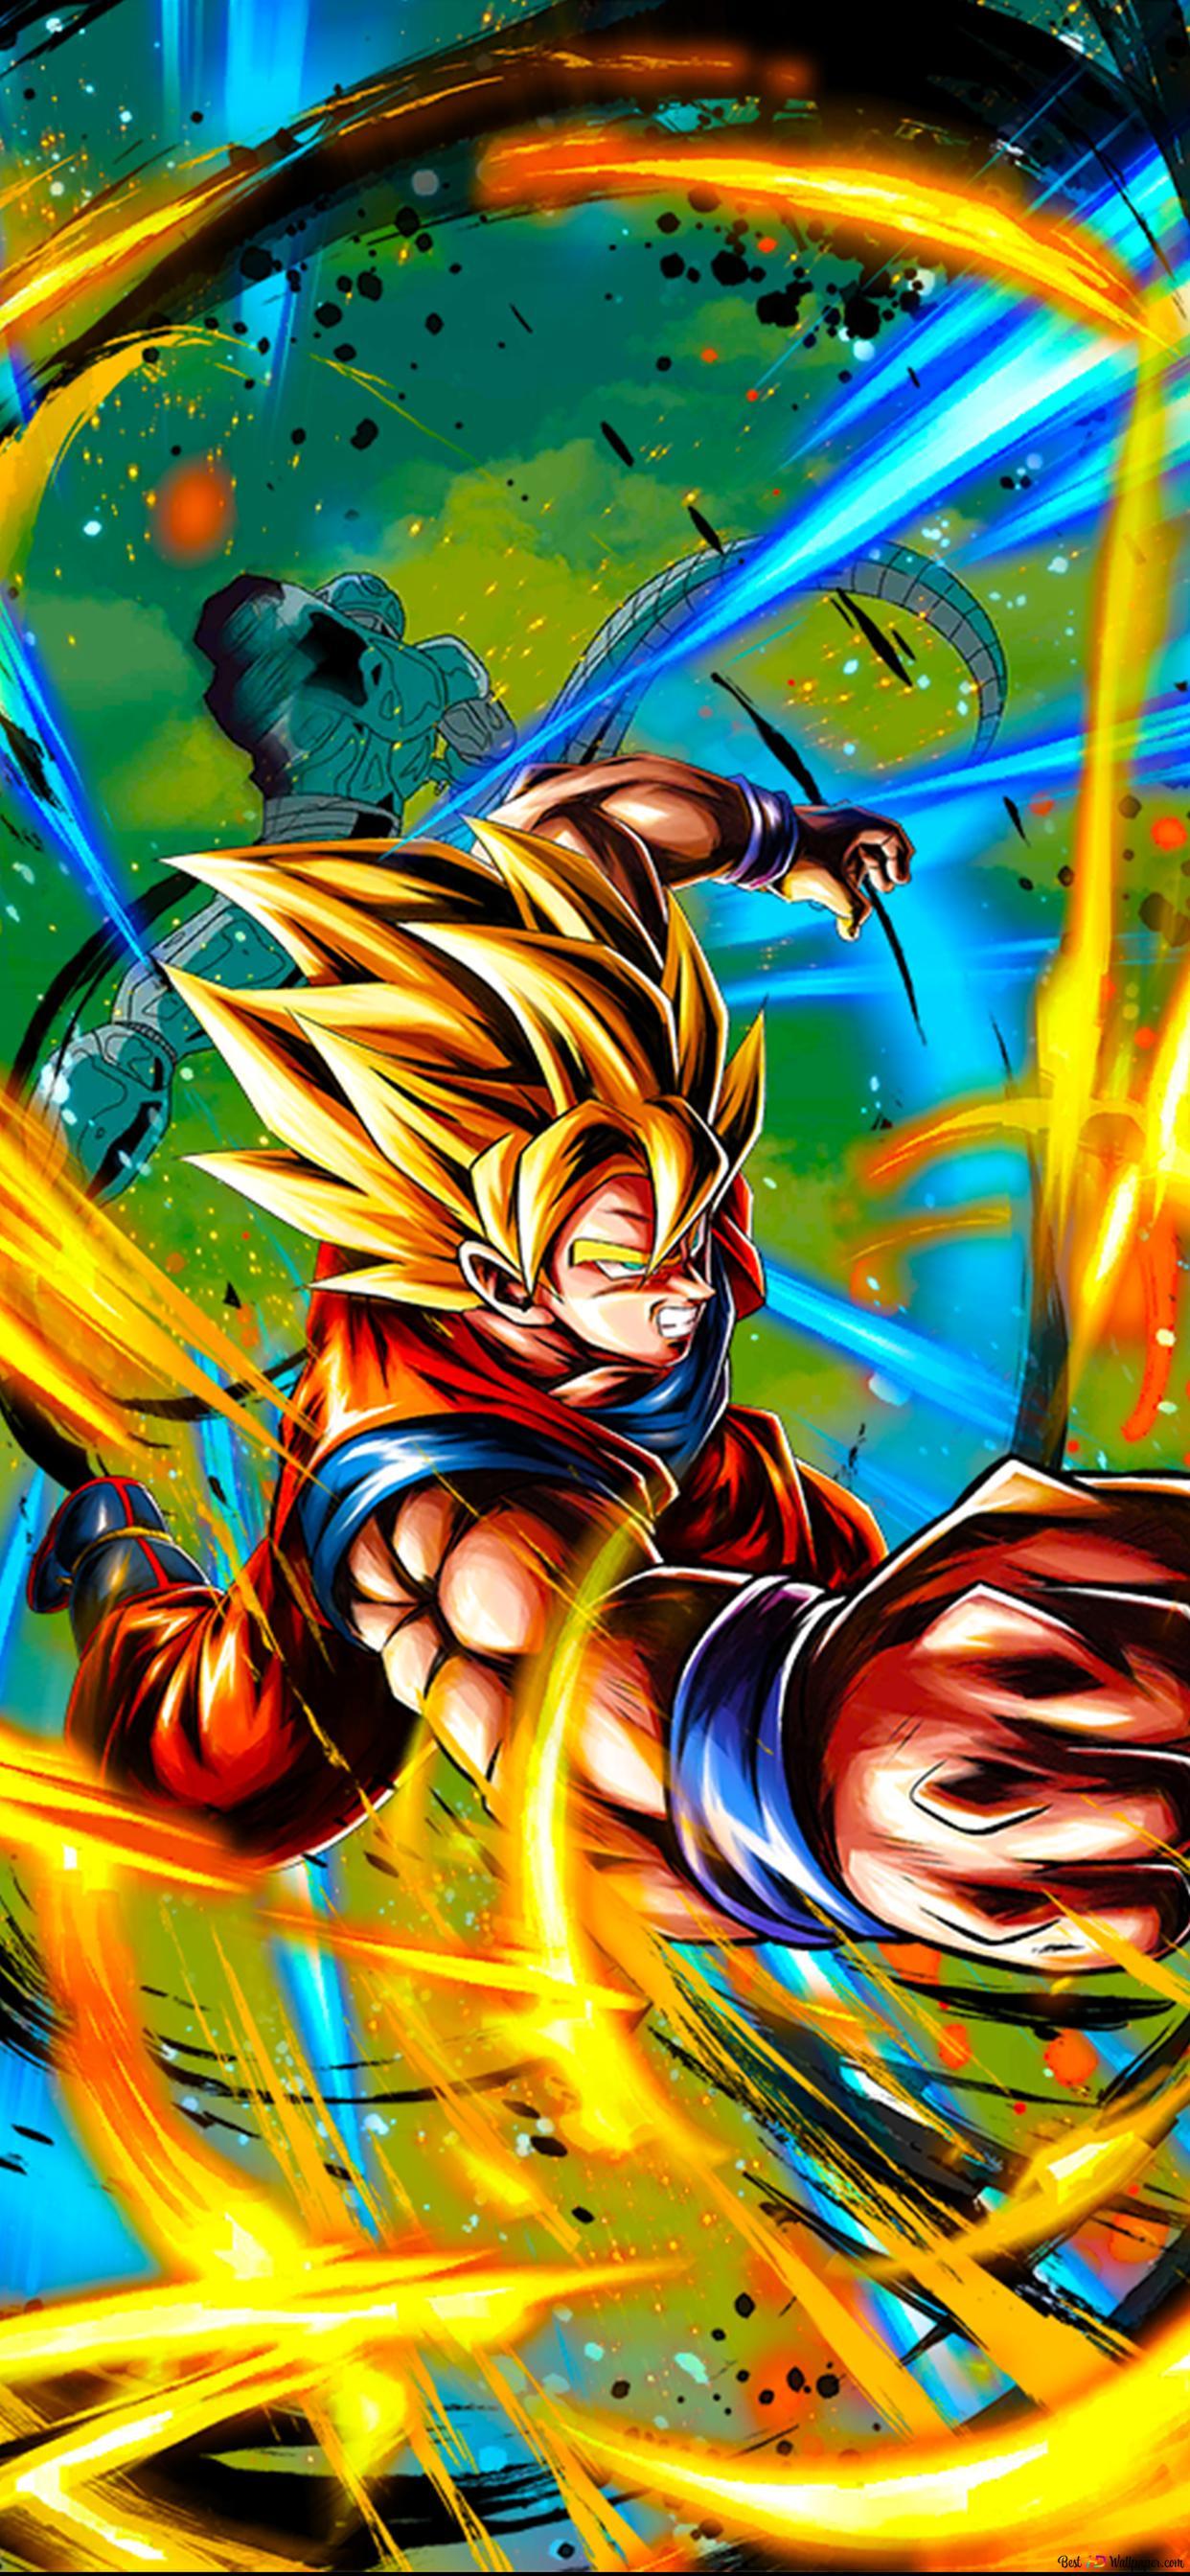 Super Saiyan Goku Dragon Ball Z Movie 7 The Return Of Cooler Android Hd Wallpaper Download